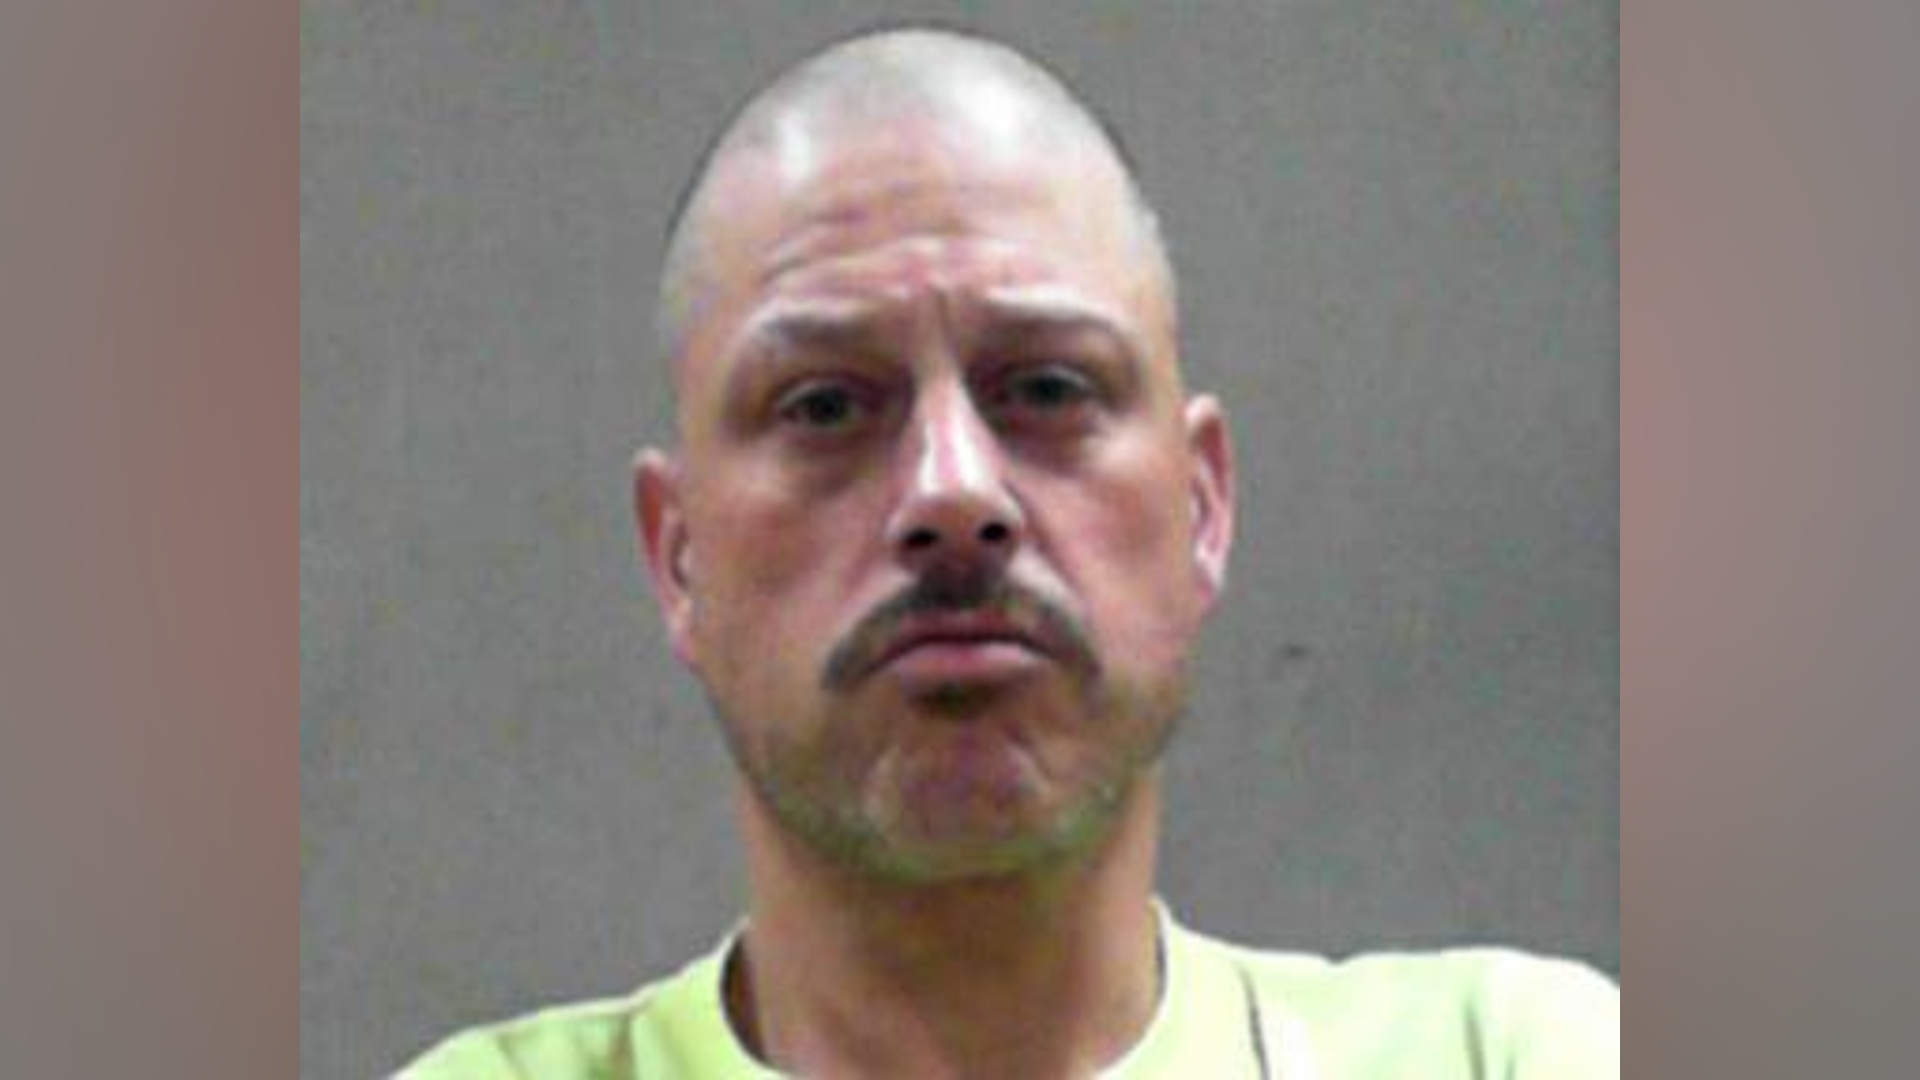 Man arrested in drug raid, 14yr old son tests positive for drugs